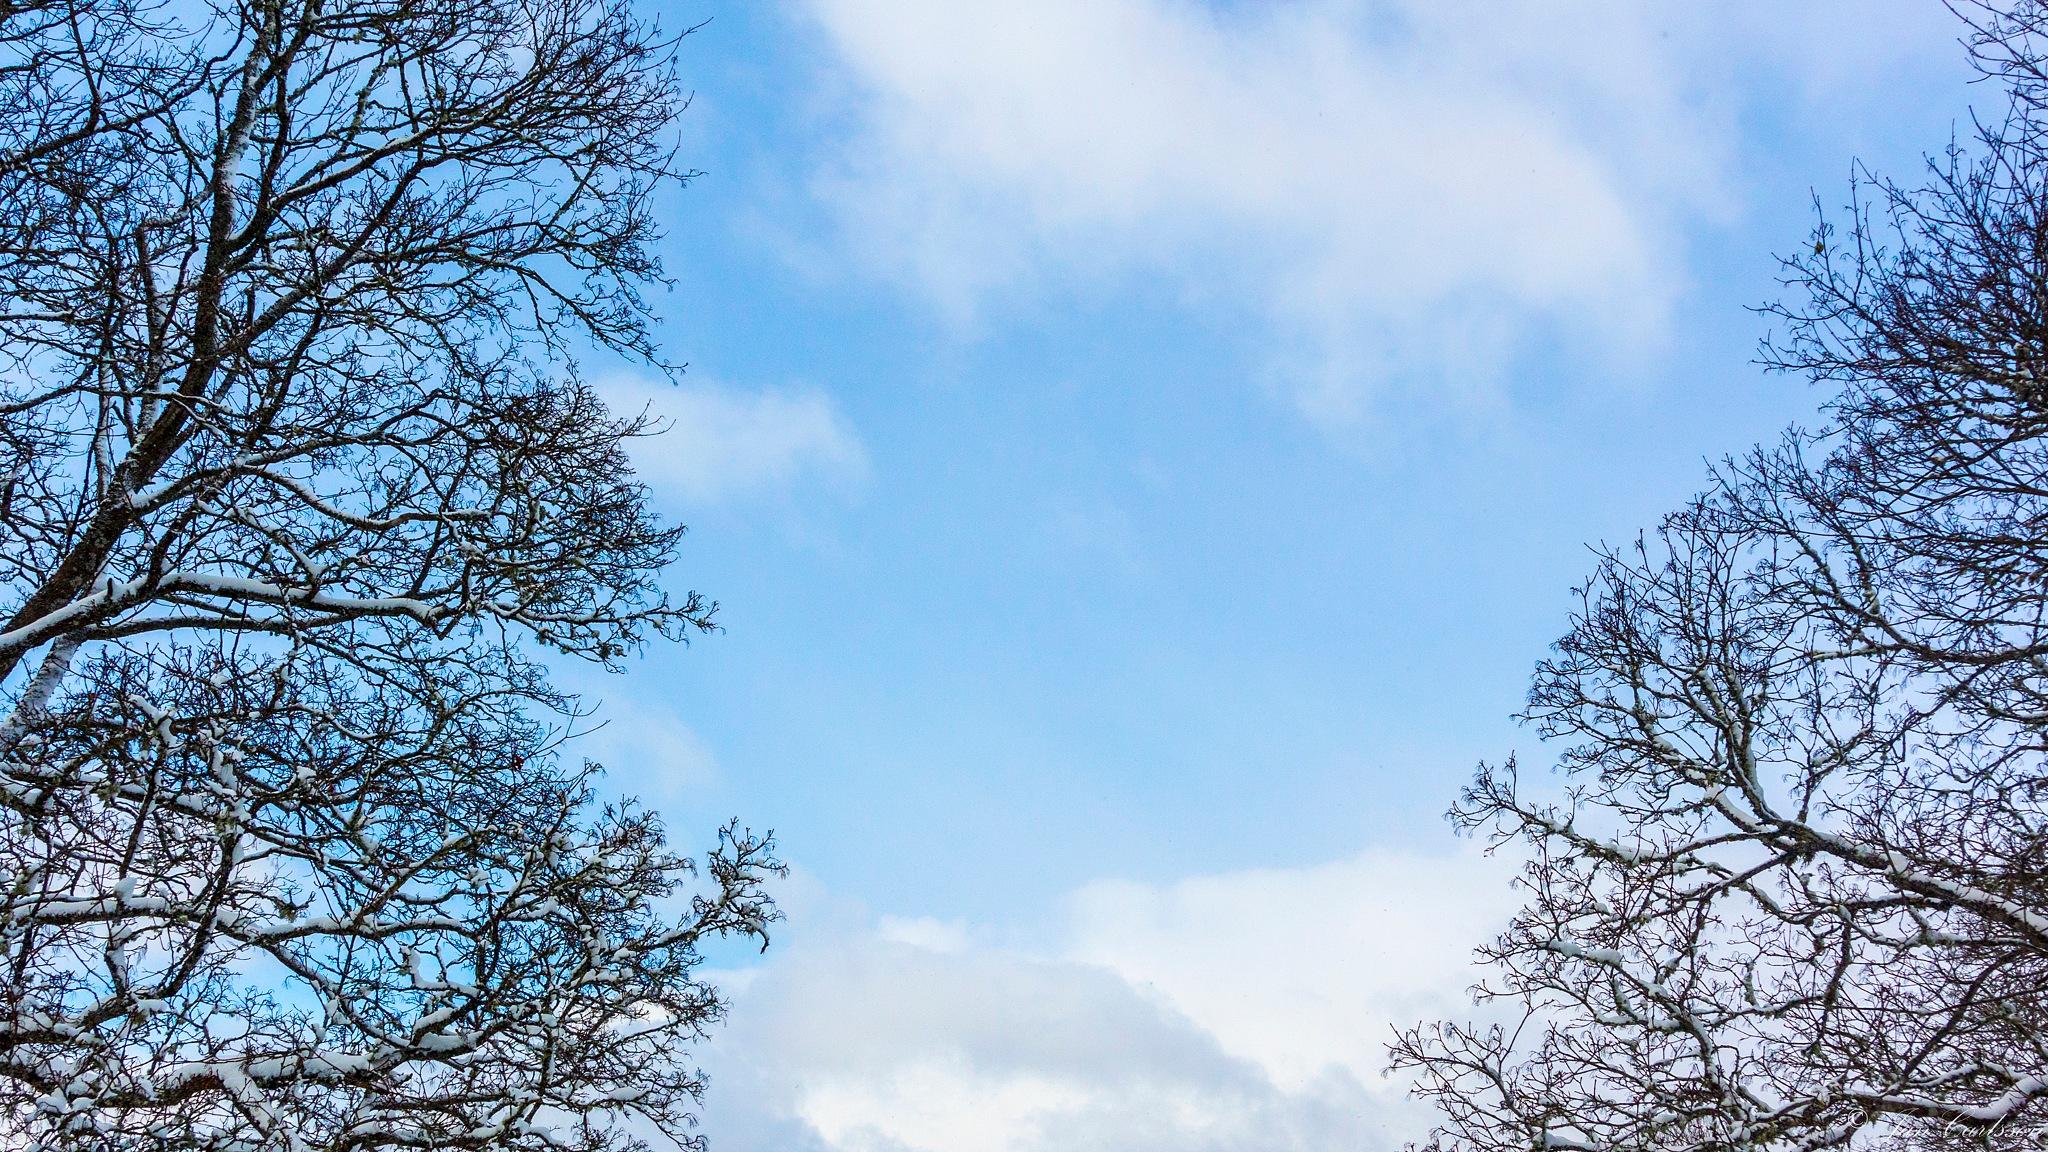 Winter - The Never Ending Story V by carljan w carlsson